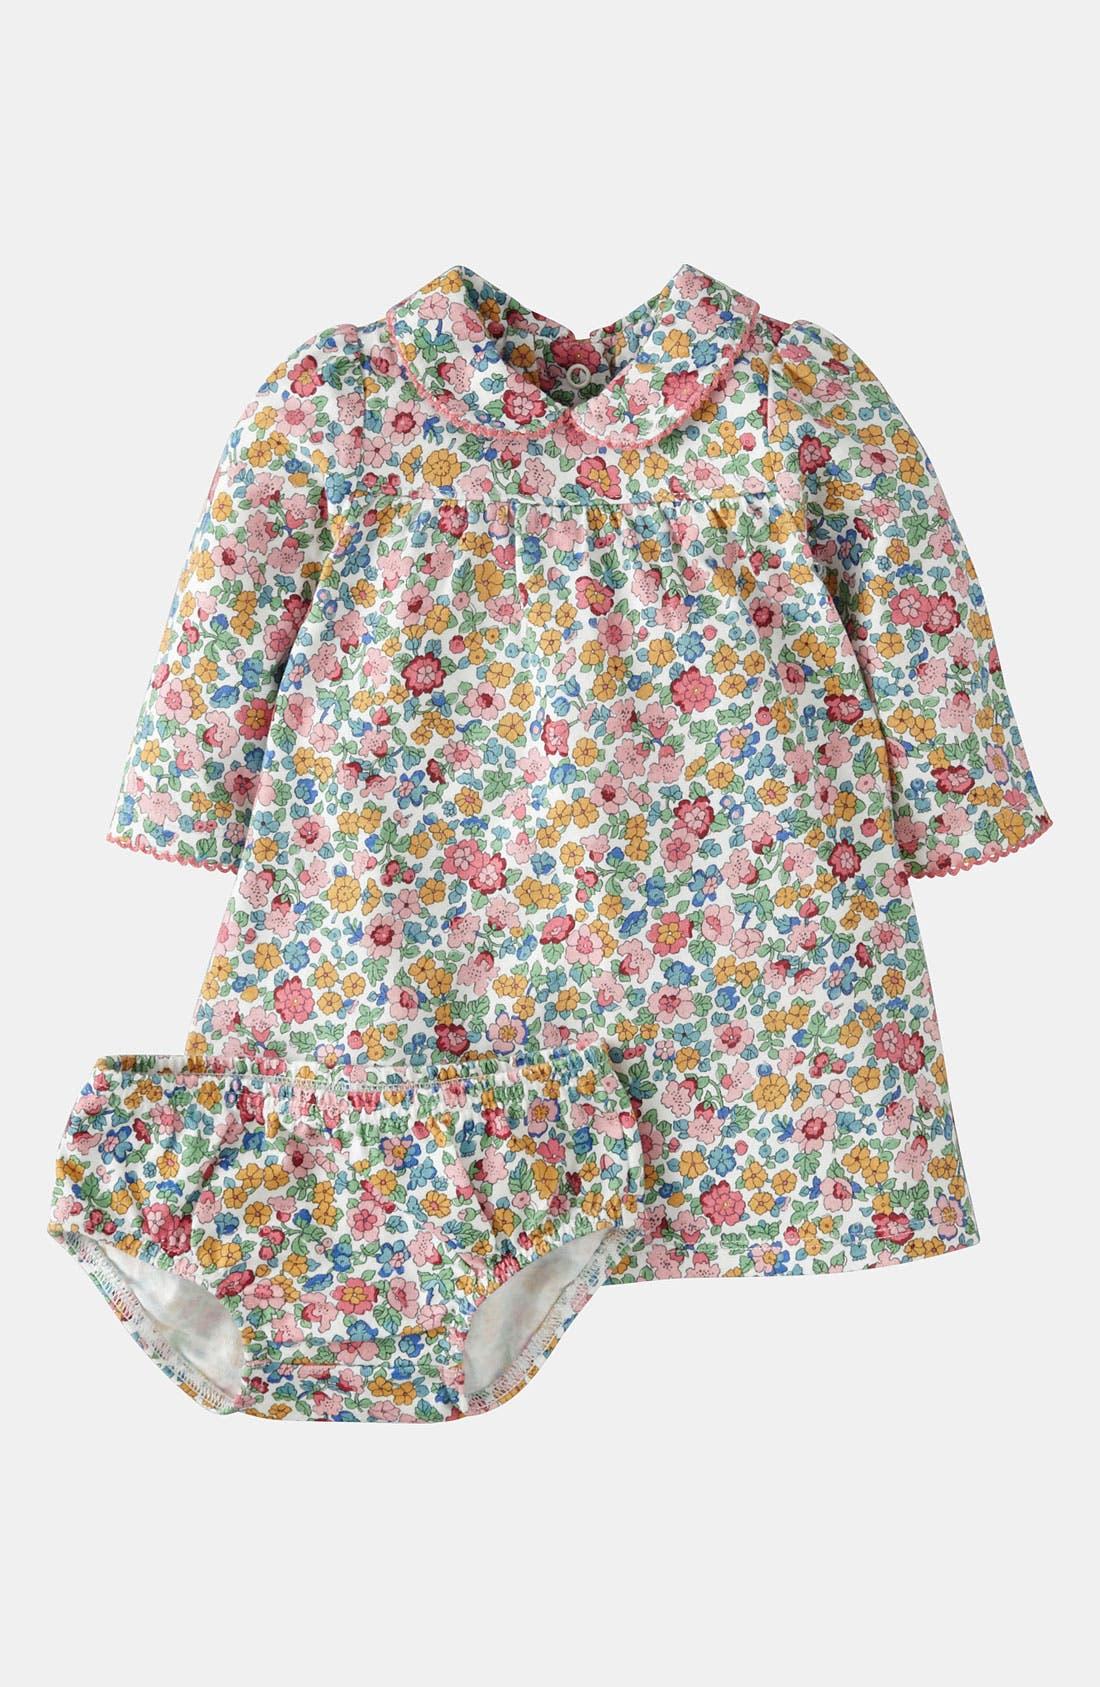 Main Image - Mini Boden 'Pretty' Jersey Dress & Bloomers (Baby)